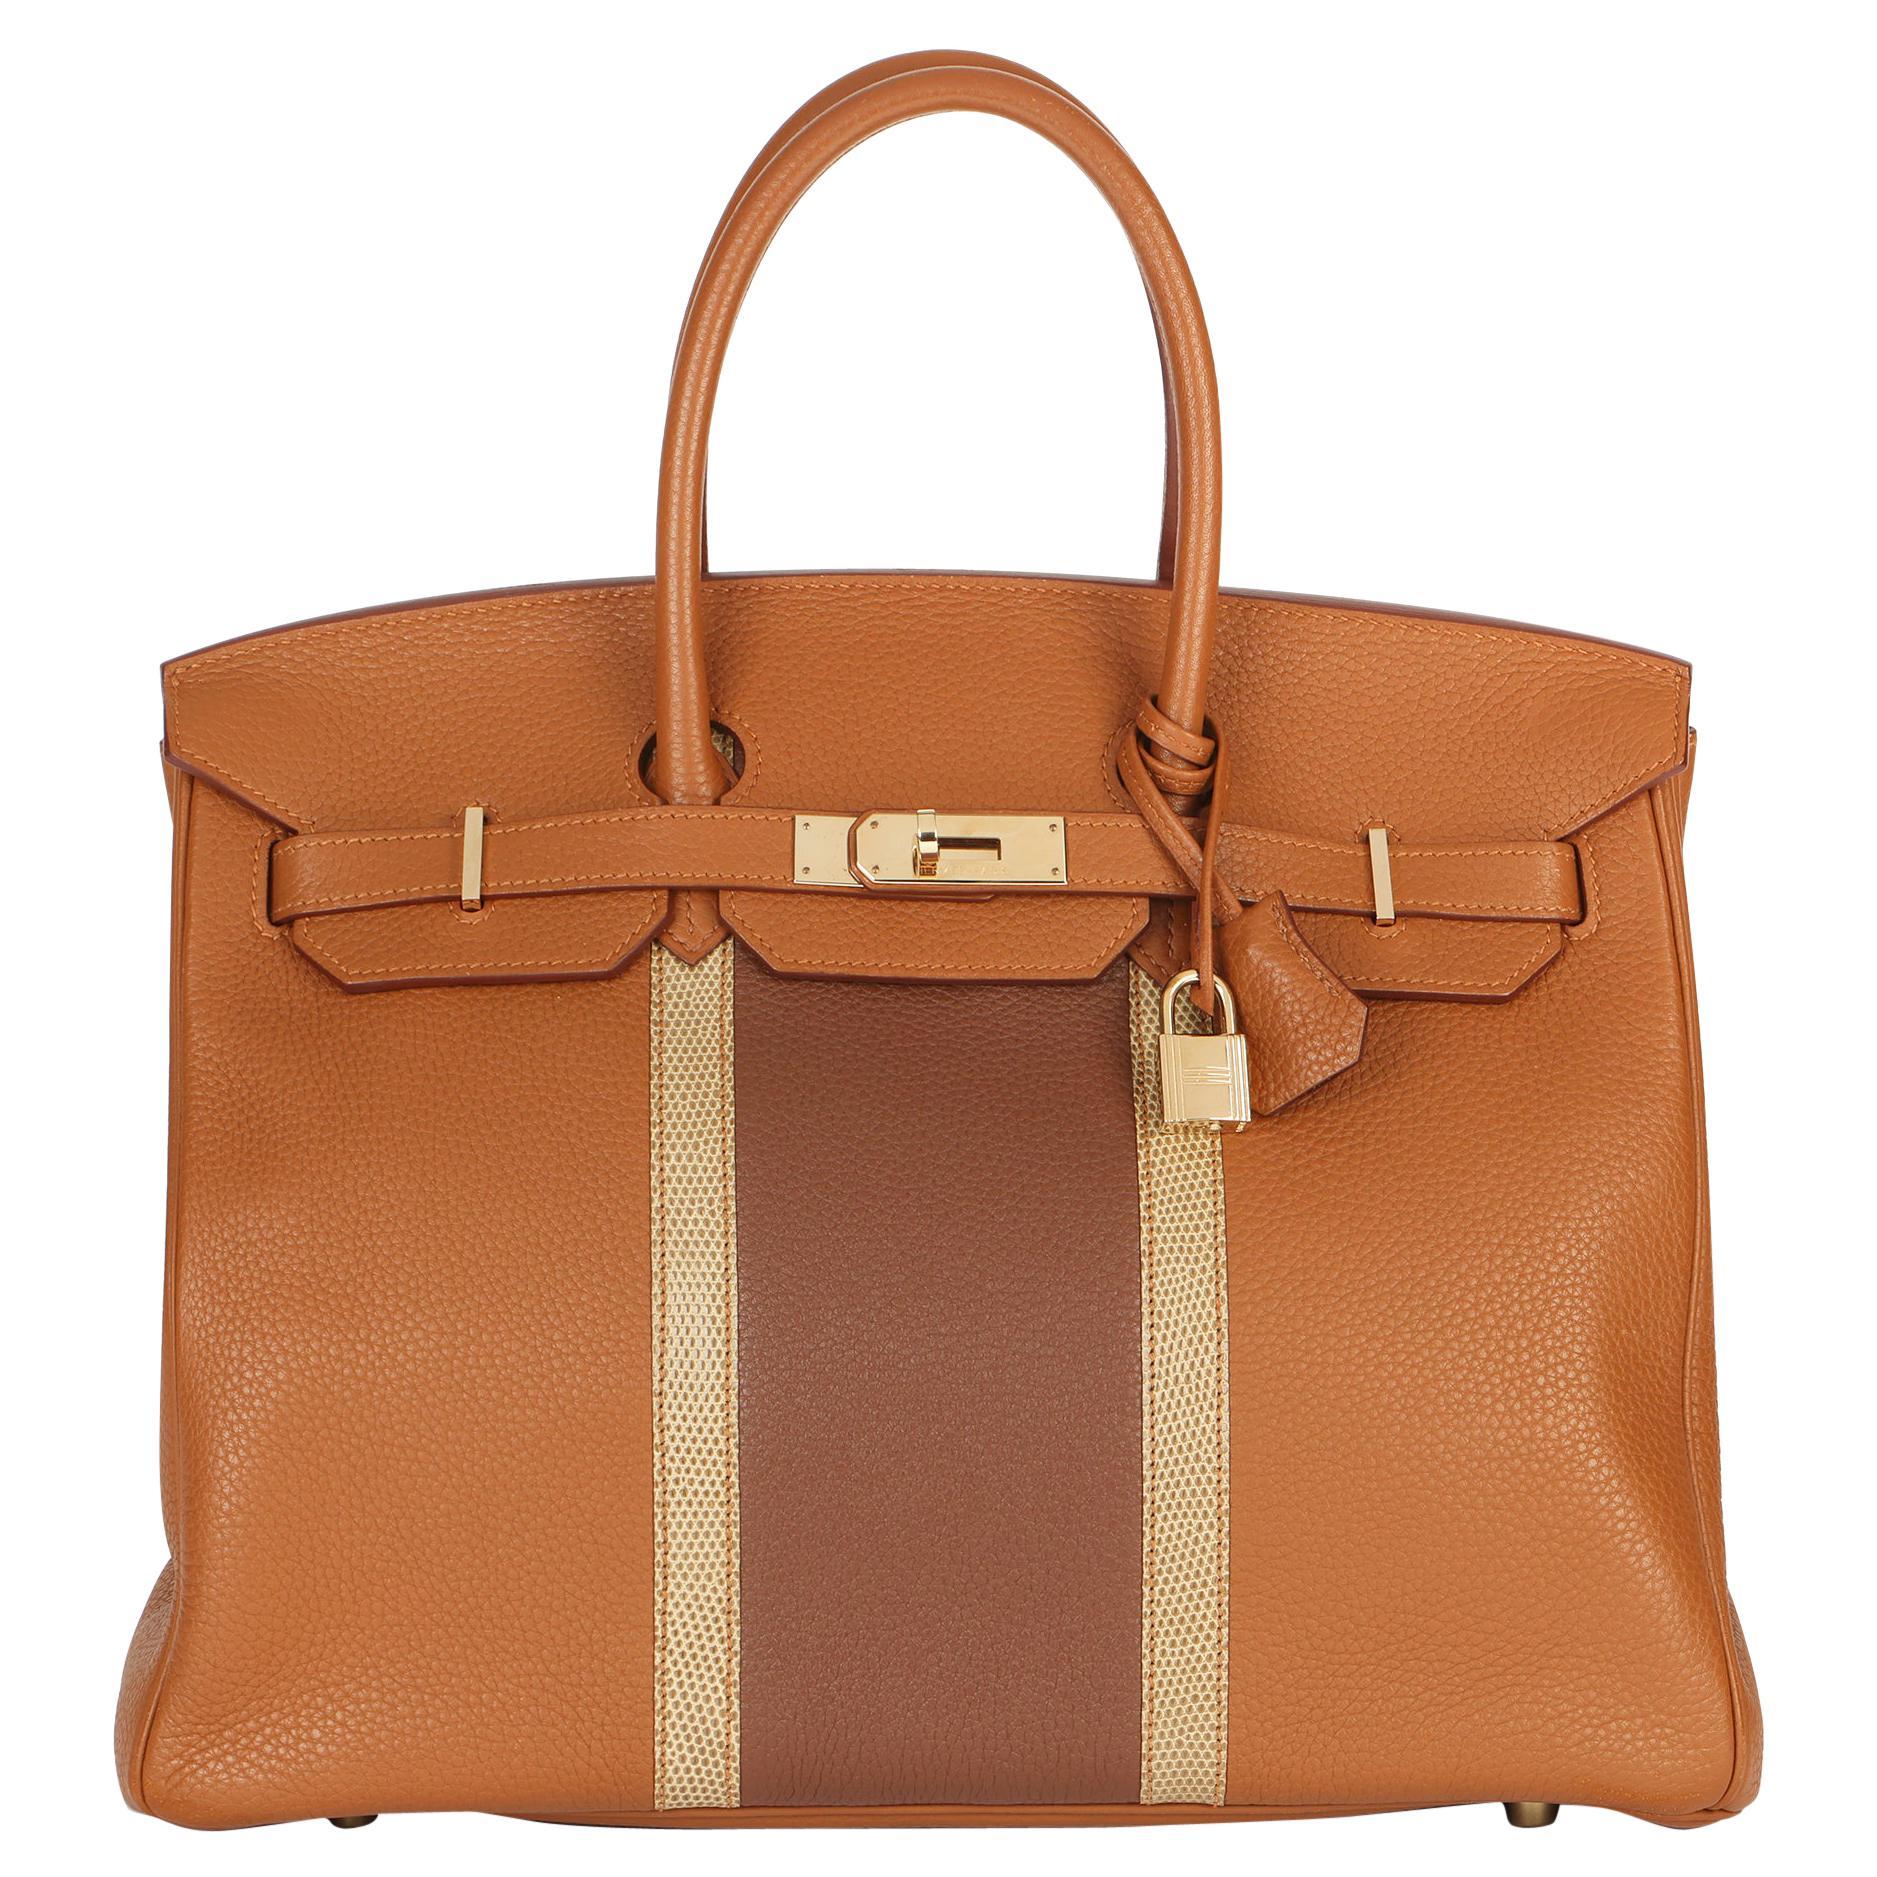 2012 Hermes Gold, Marron d'Inde Clemence Leather & Lizard Leather Club Birkin 35